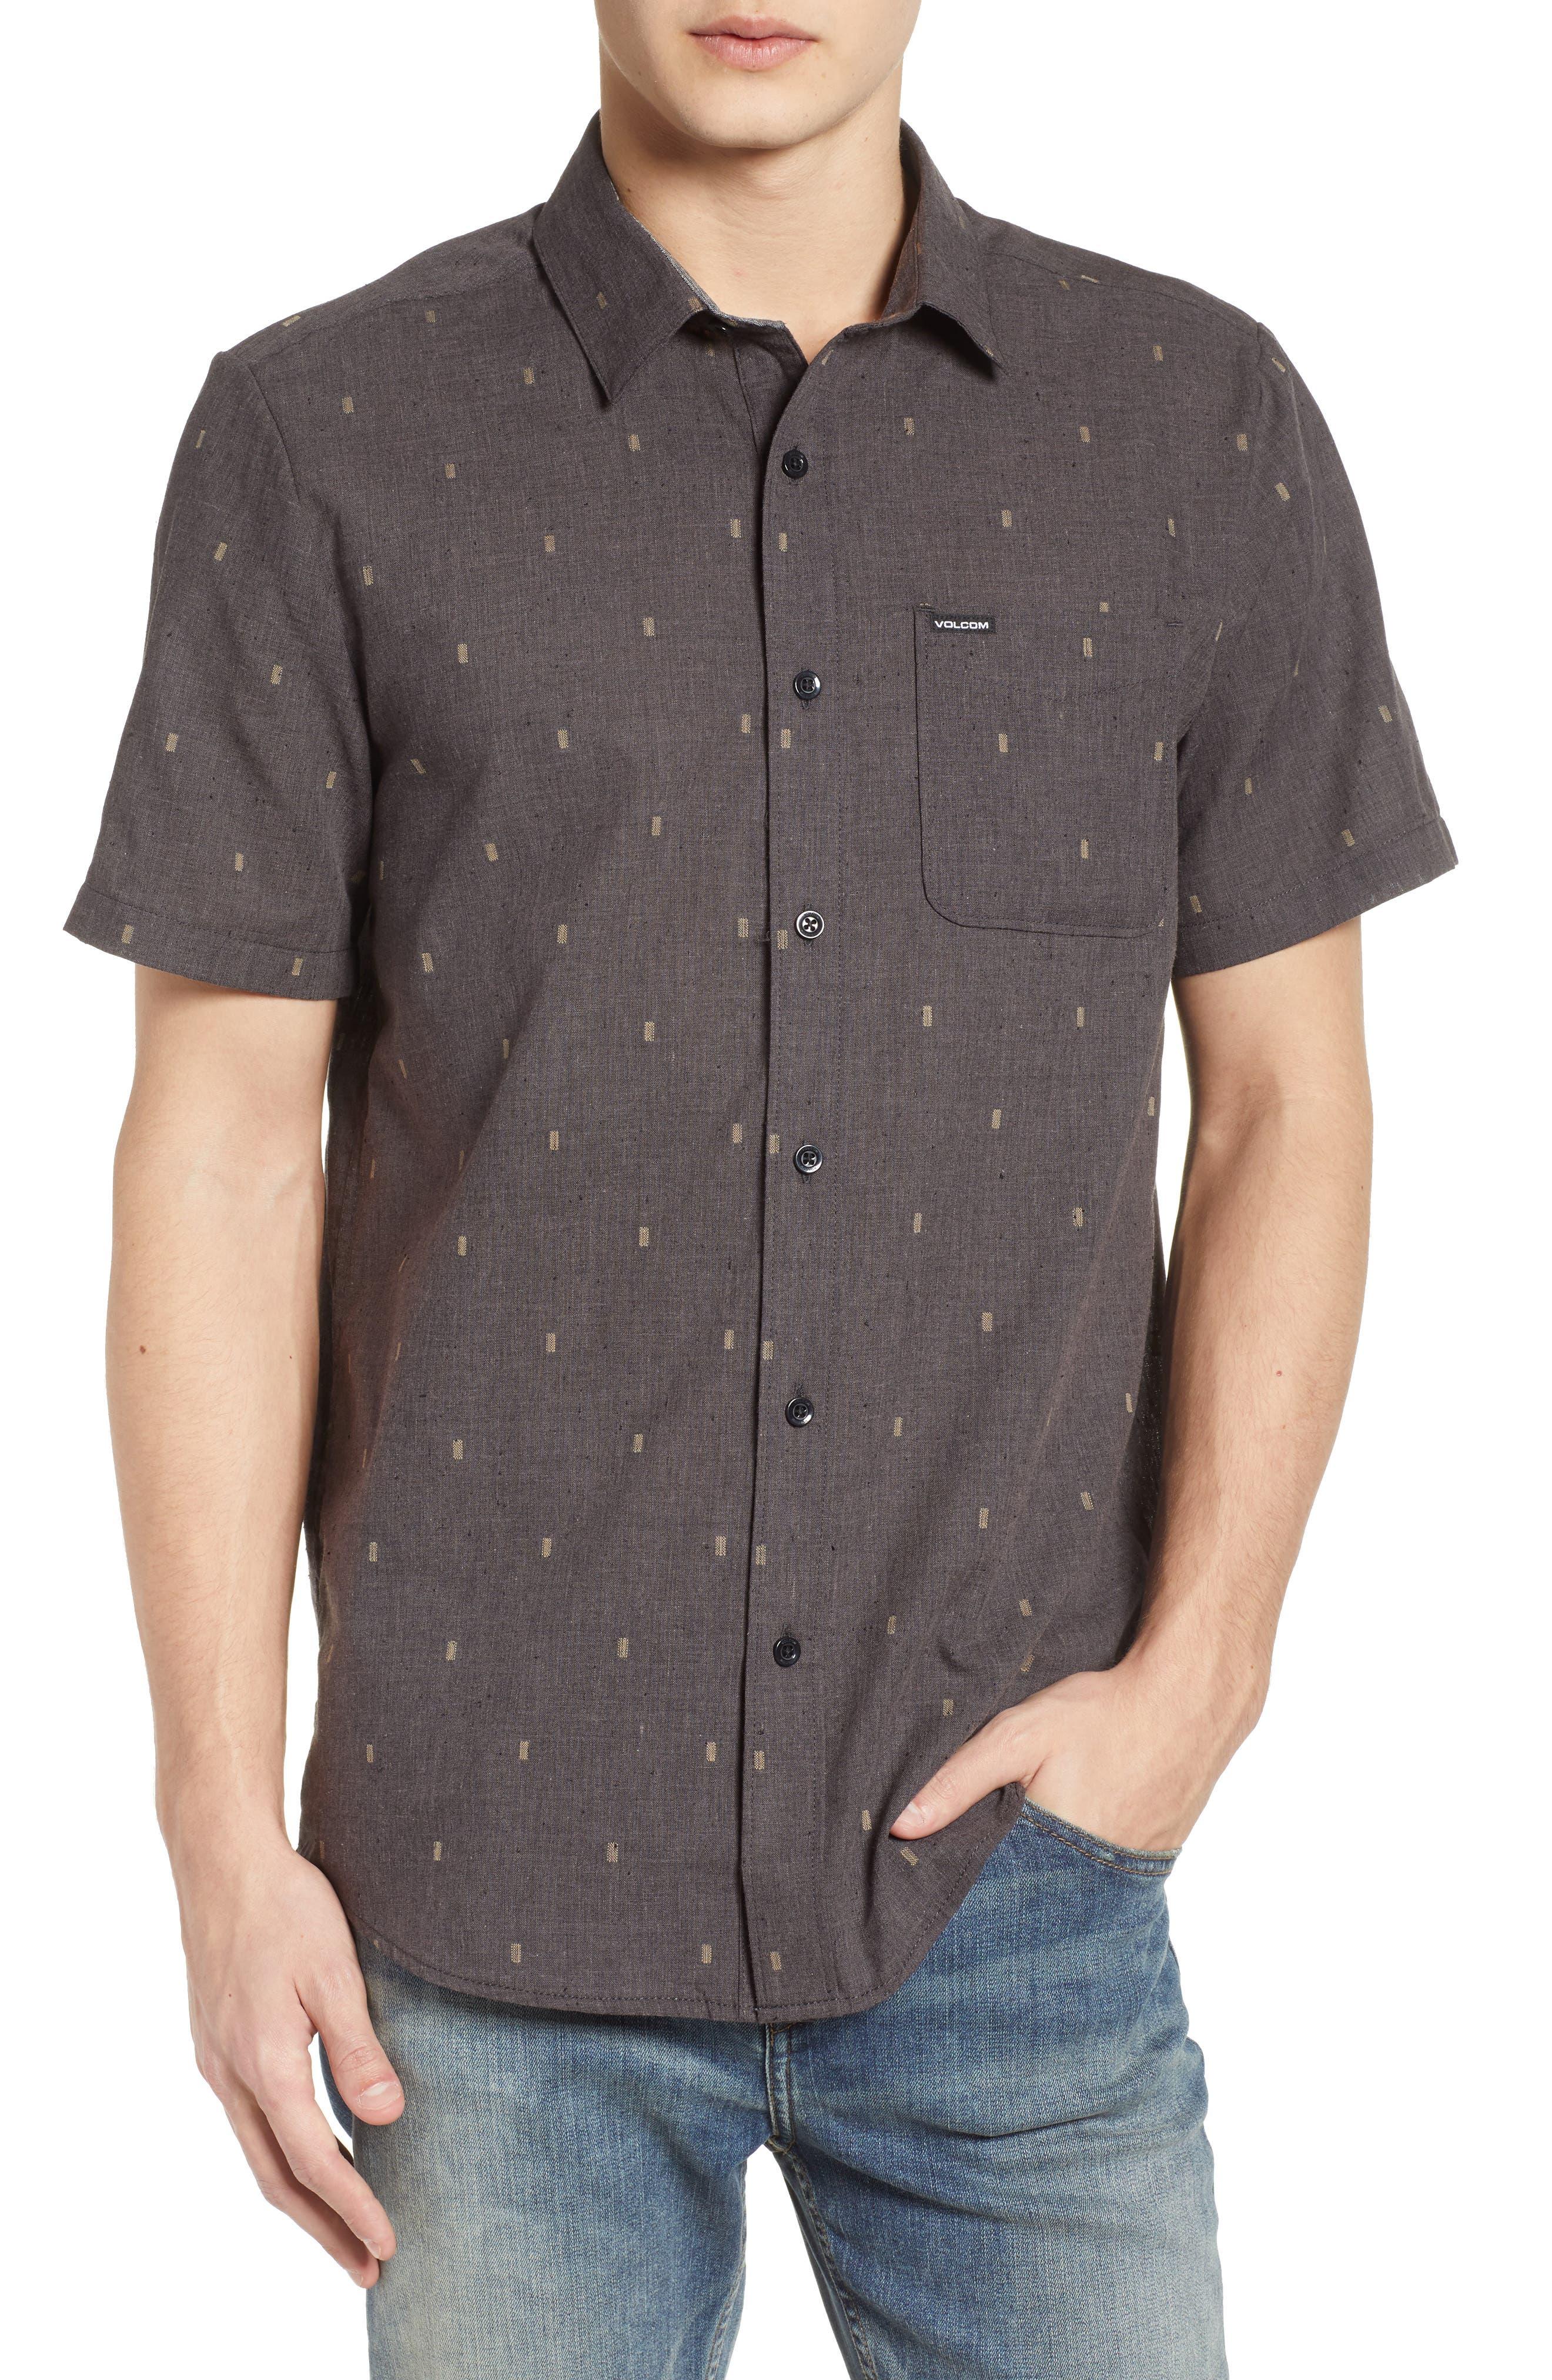 Gladstone Short Sleeve Shirt,                         Main,                         color, 001